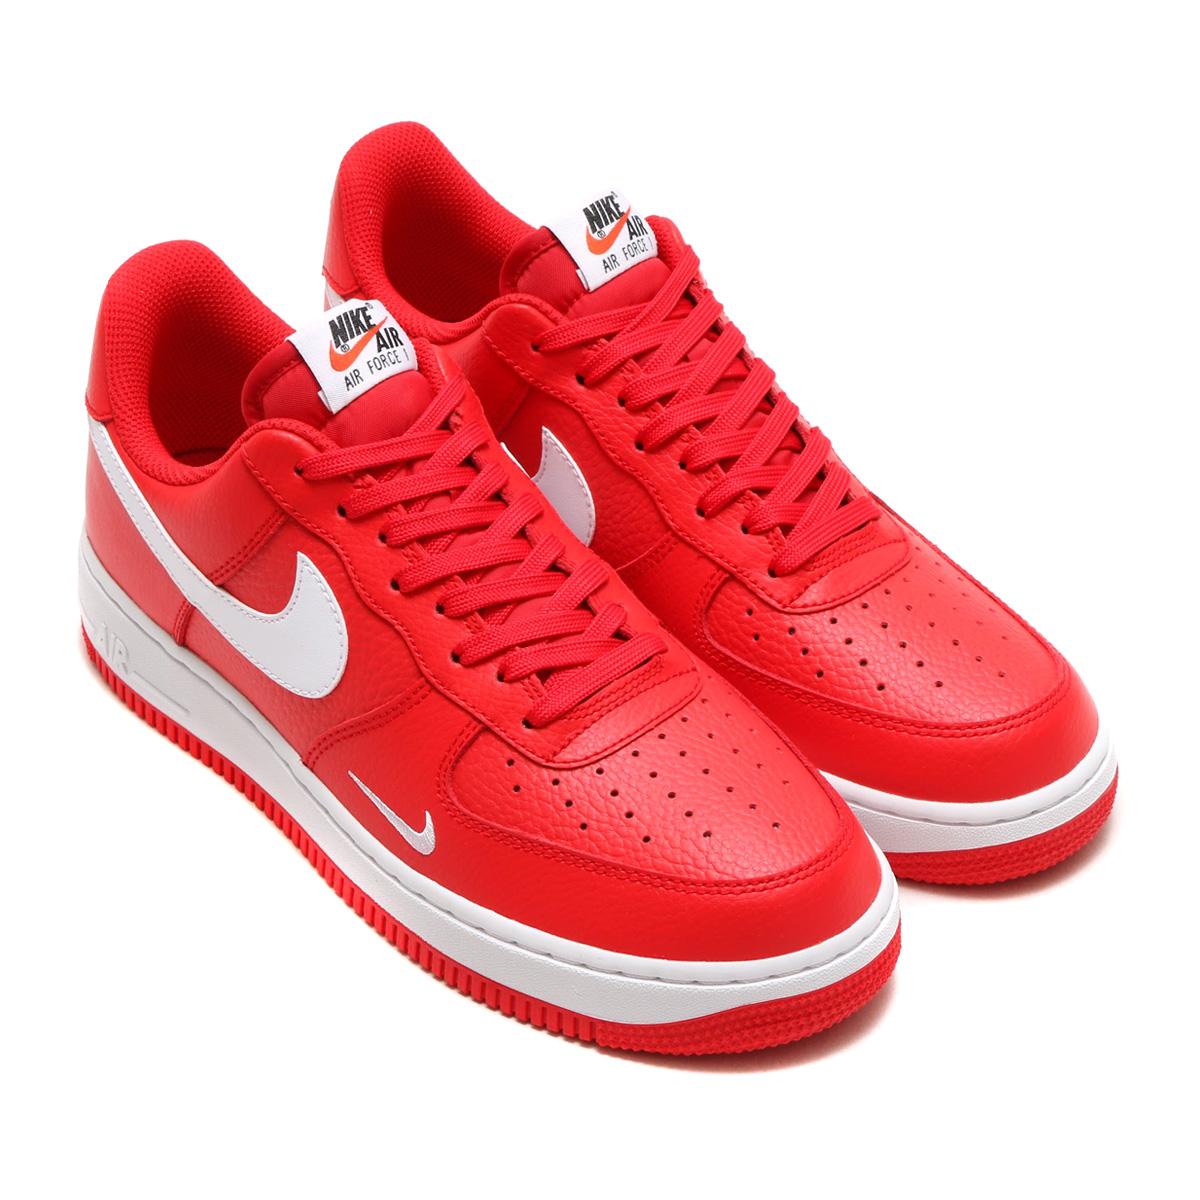 423cd43e4948 atmos pink  NIKE AIR FORCE 1 (Nike air force 1 07) UNIVERSITY RED WHITE- WHITE-BLACK 17FA-I